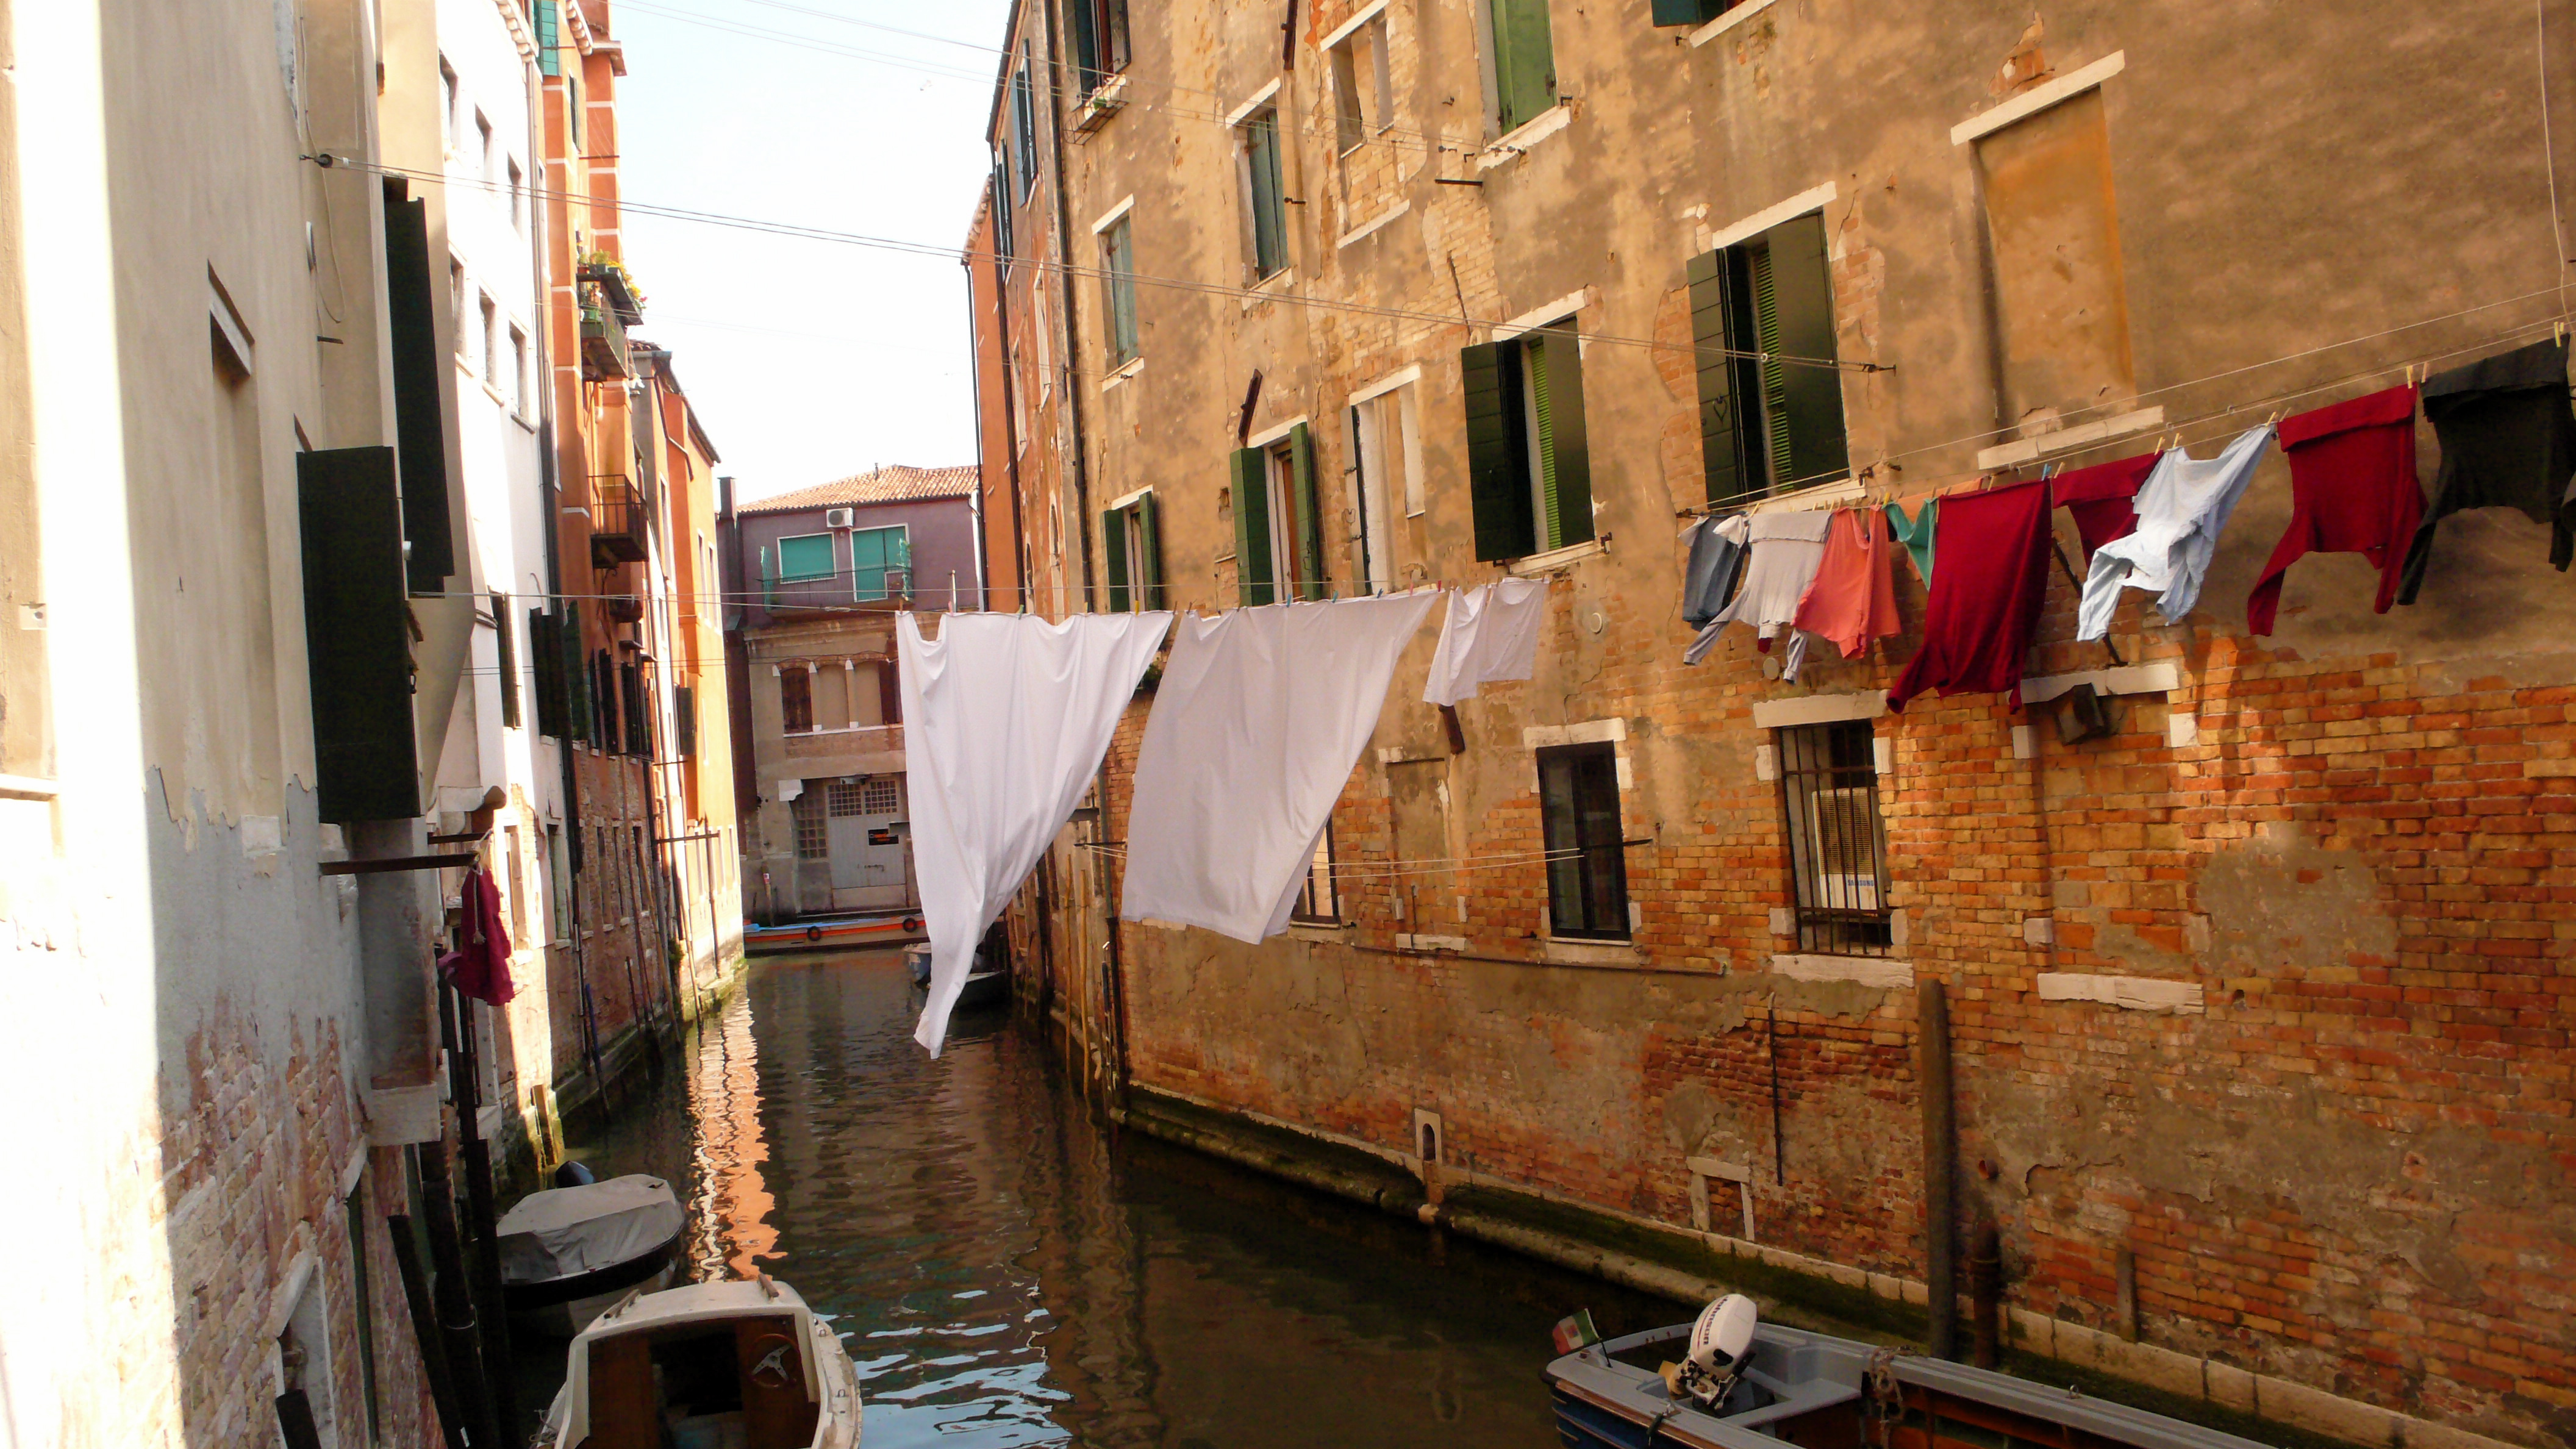 venitian clothesline